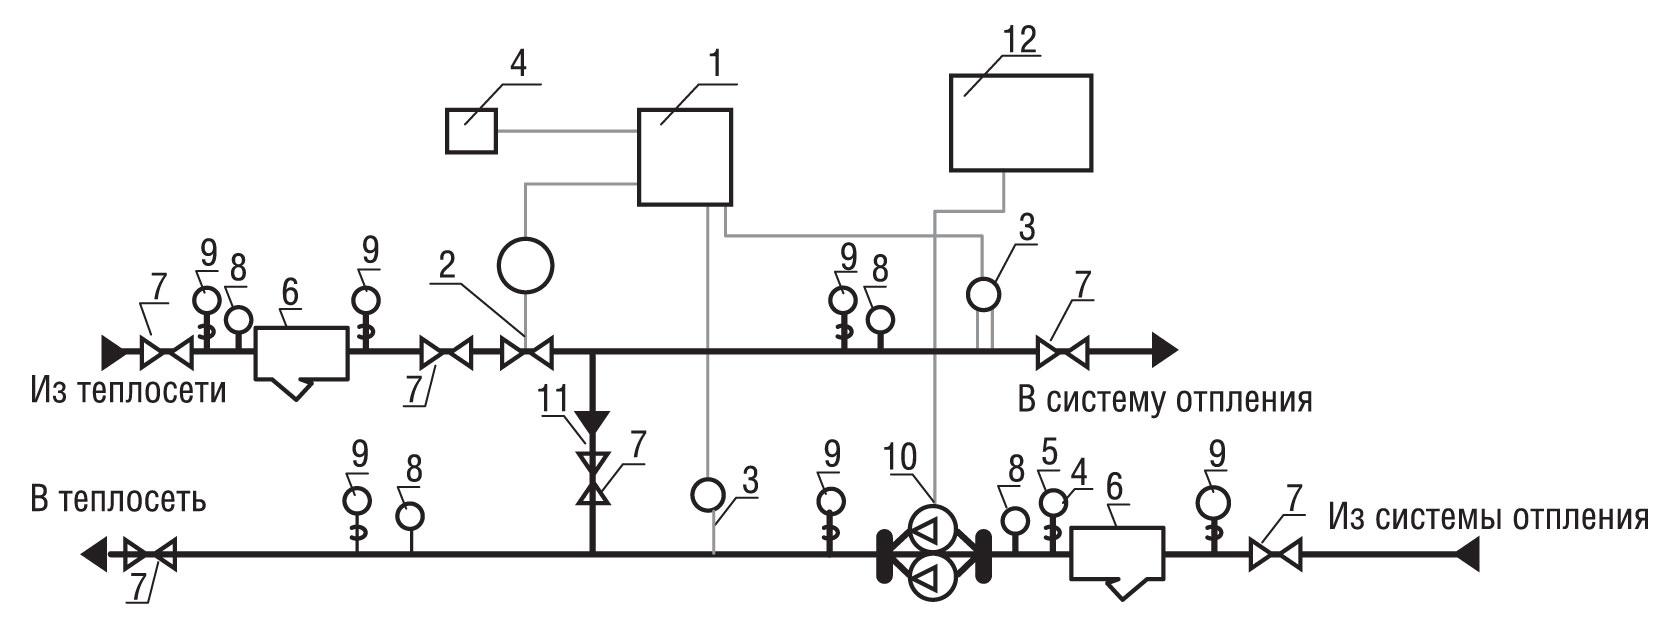 схема или чертёж теплового узла